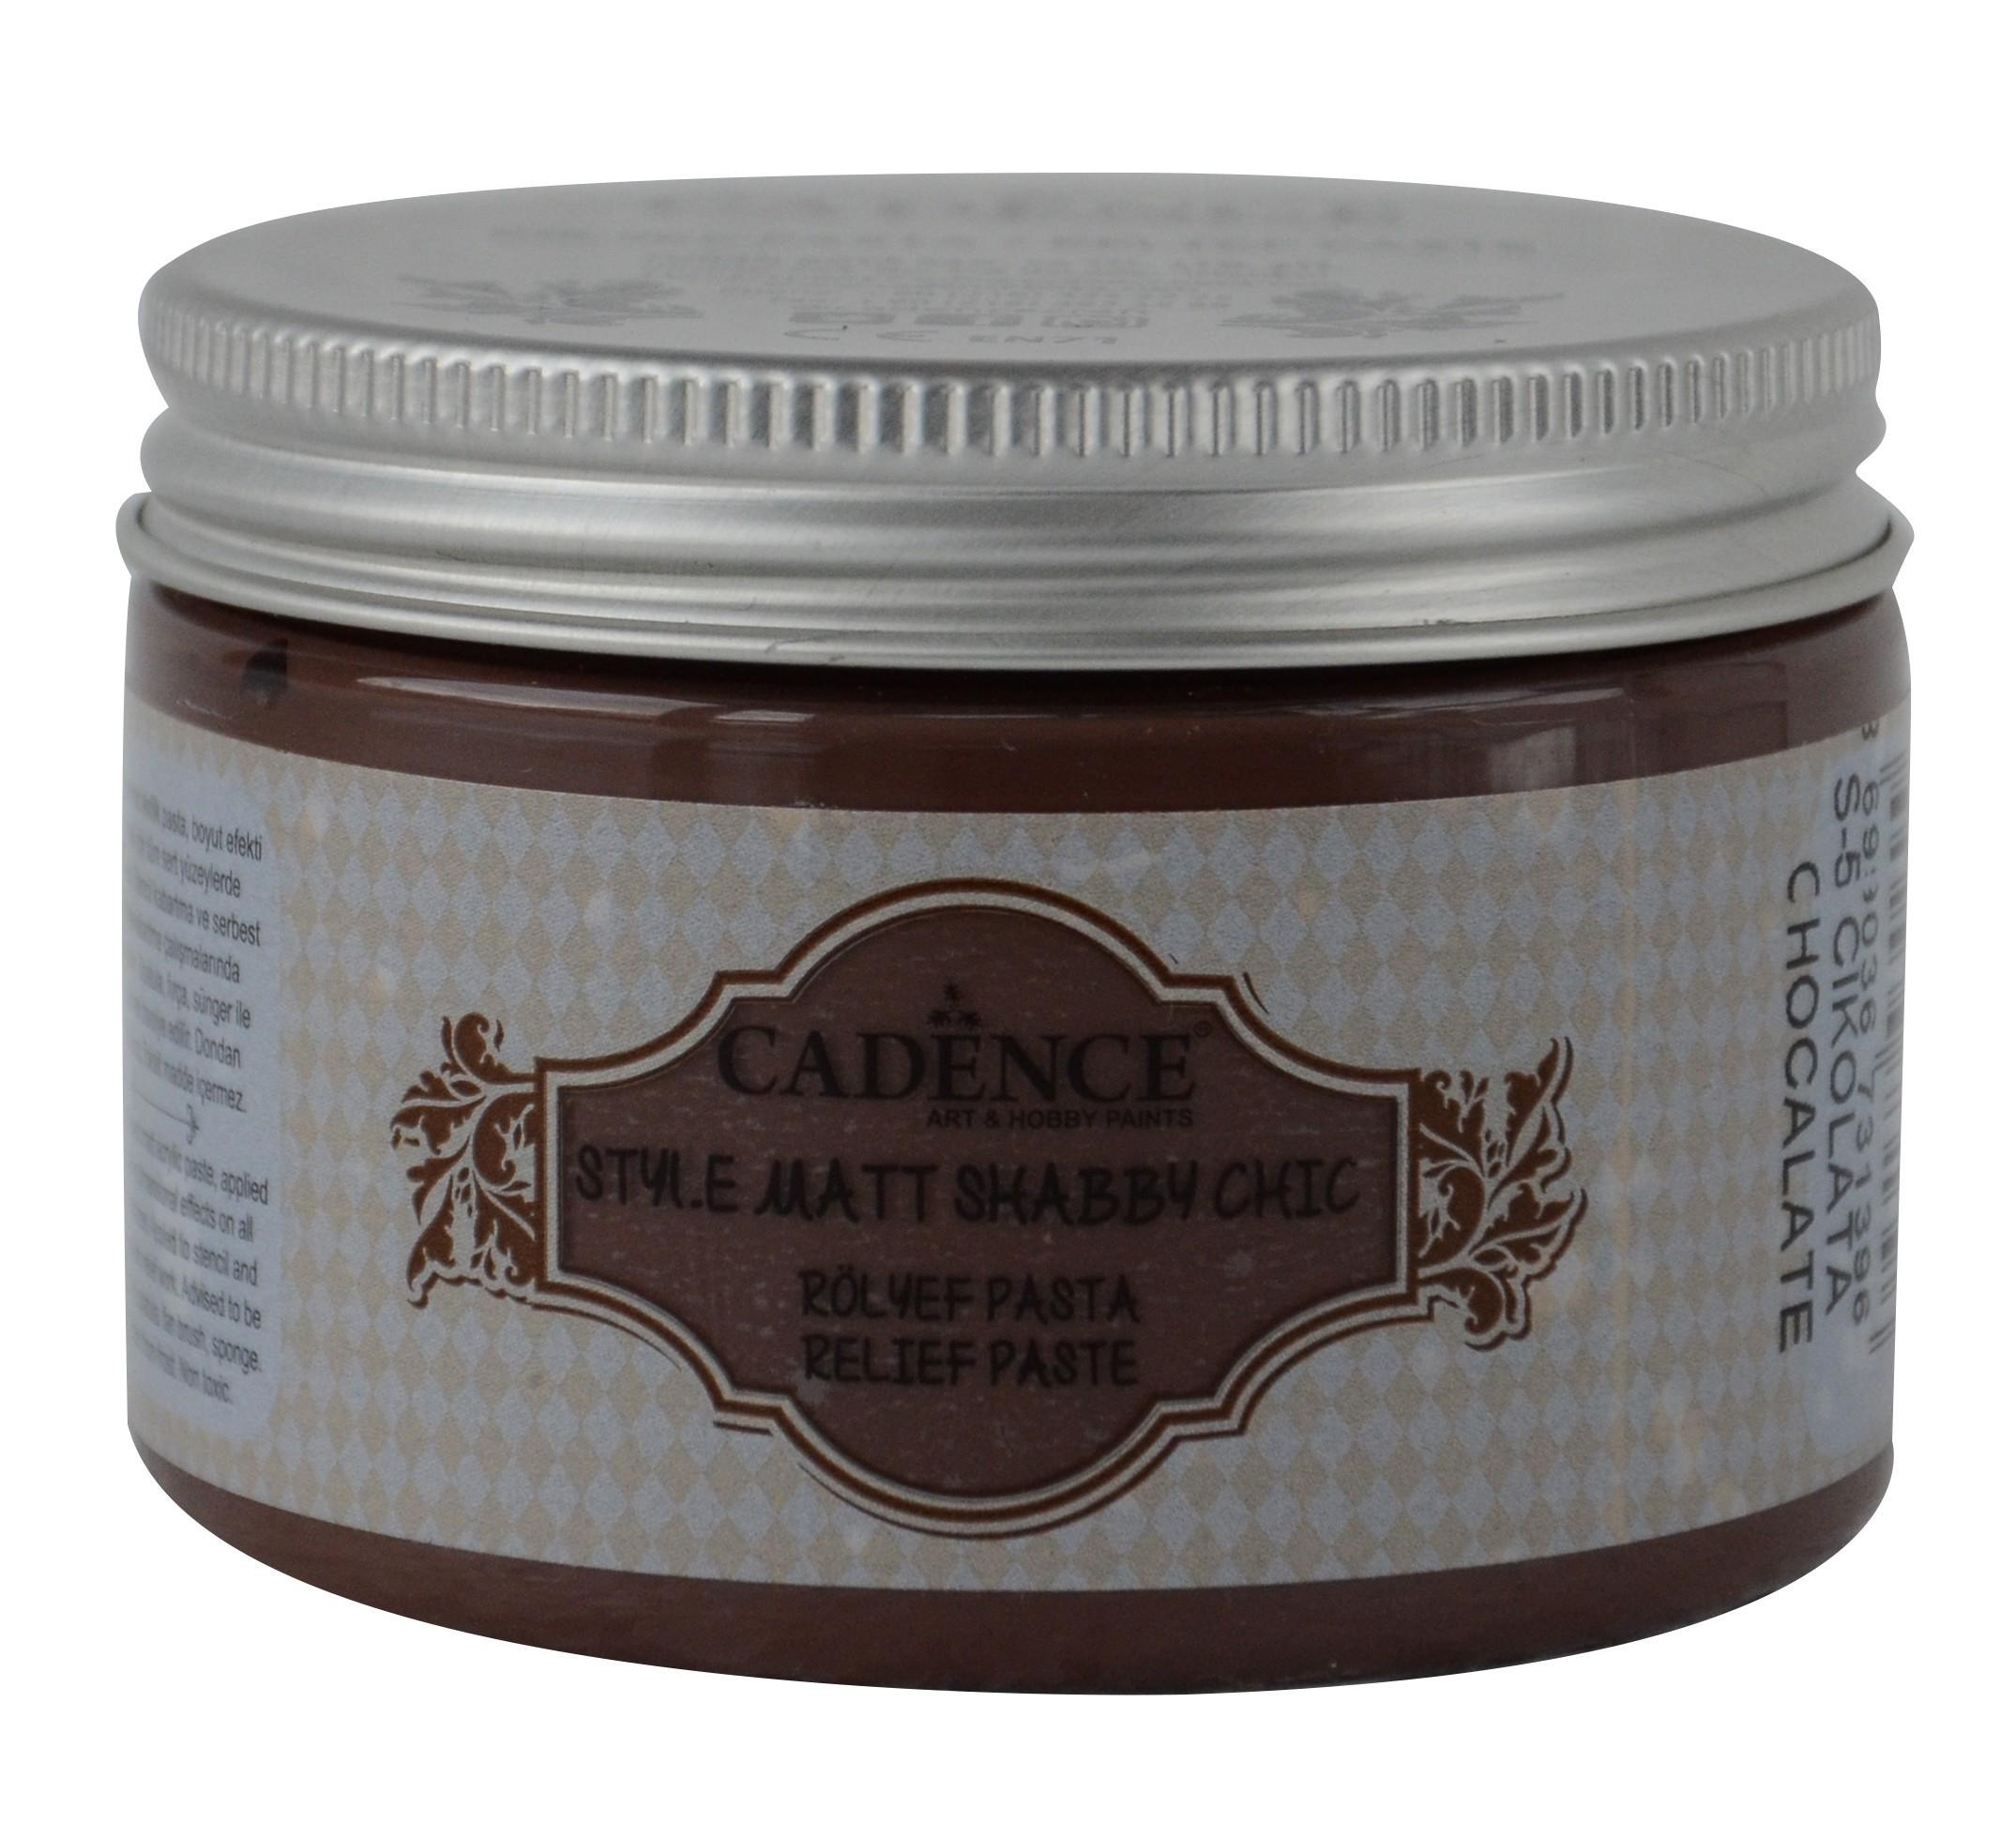 SR05 Çikolata Shabby Chic Rölyef Pasta(Mat) renkleri